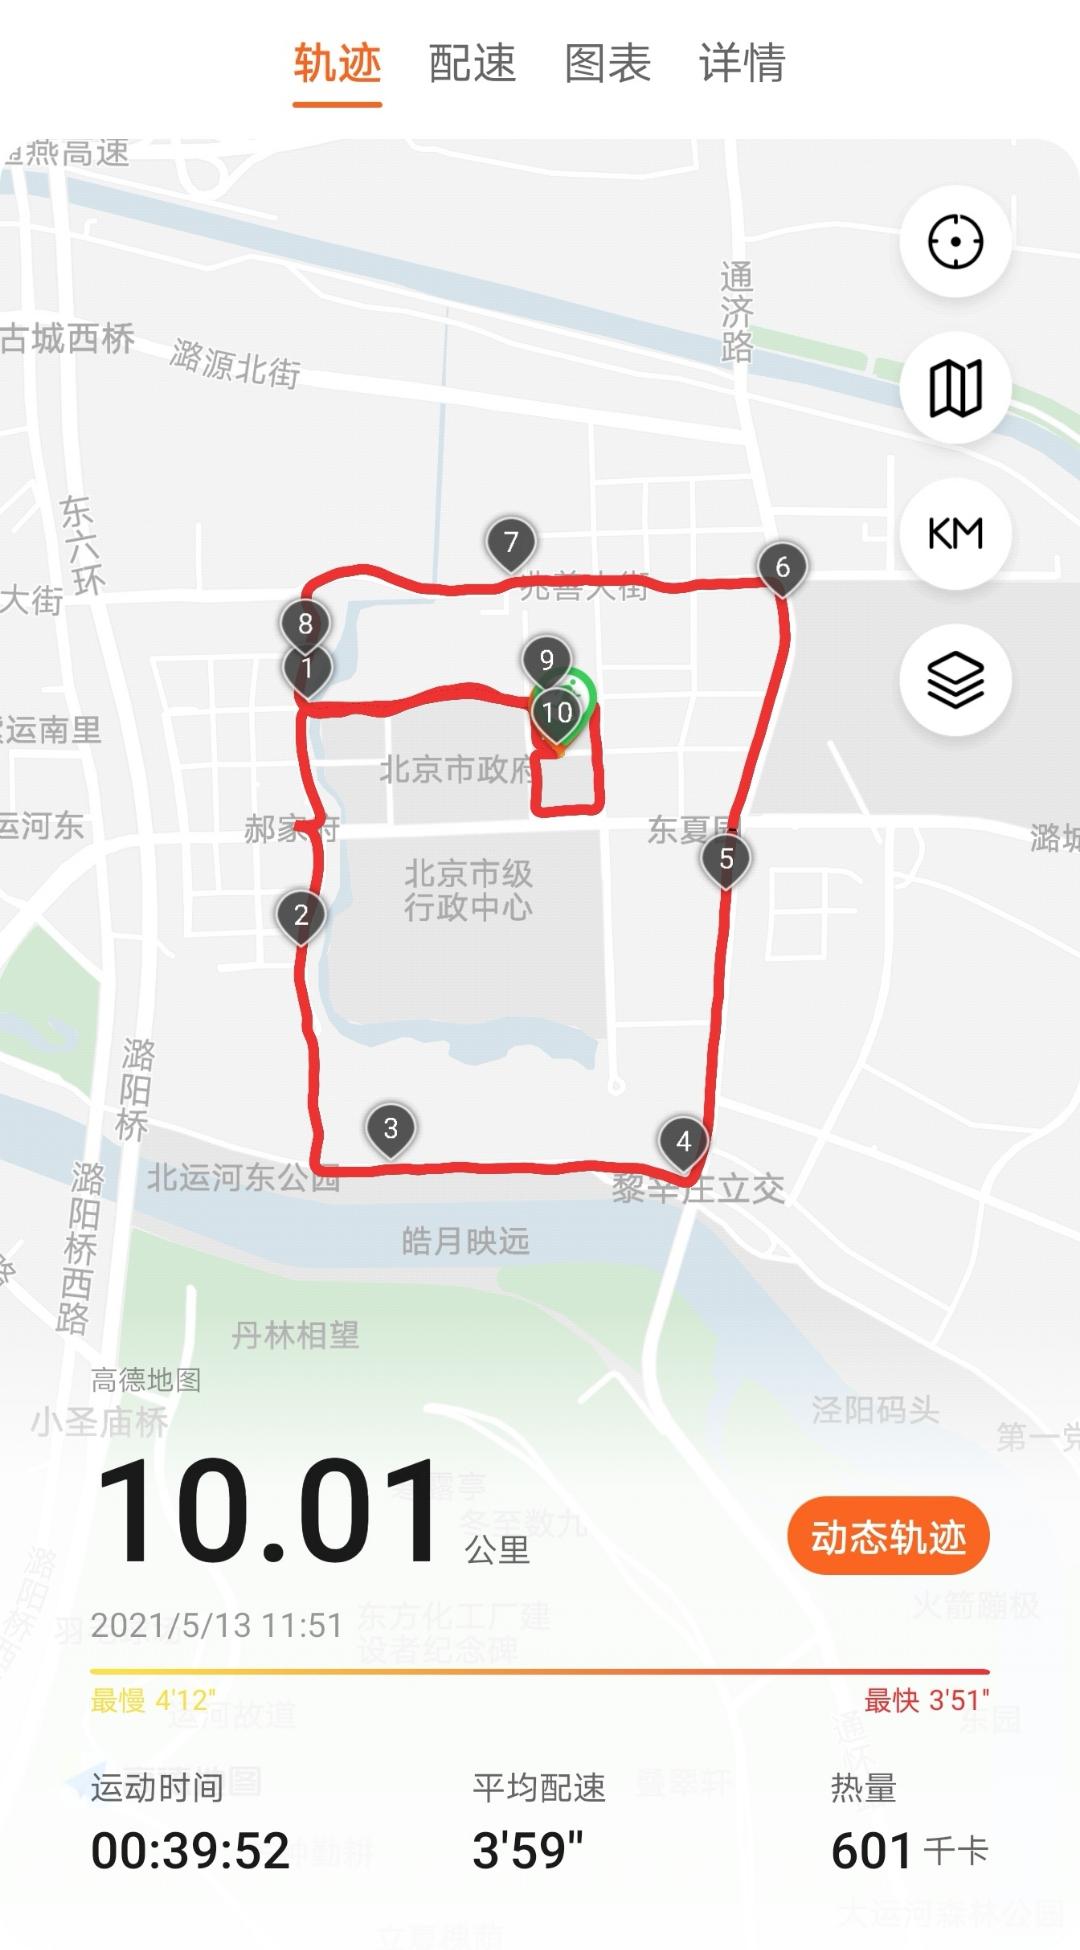 Screenshot_20210513_125048_com.huawei.health_edit_189194486019047.jpg